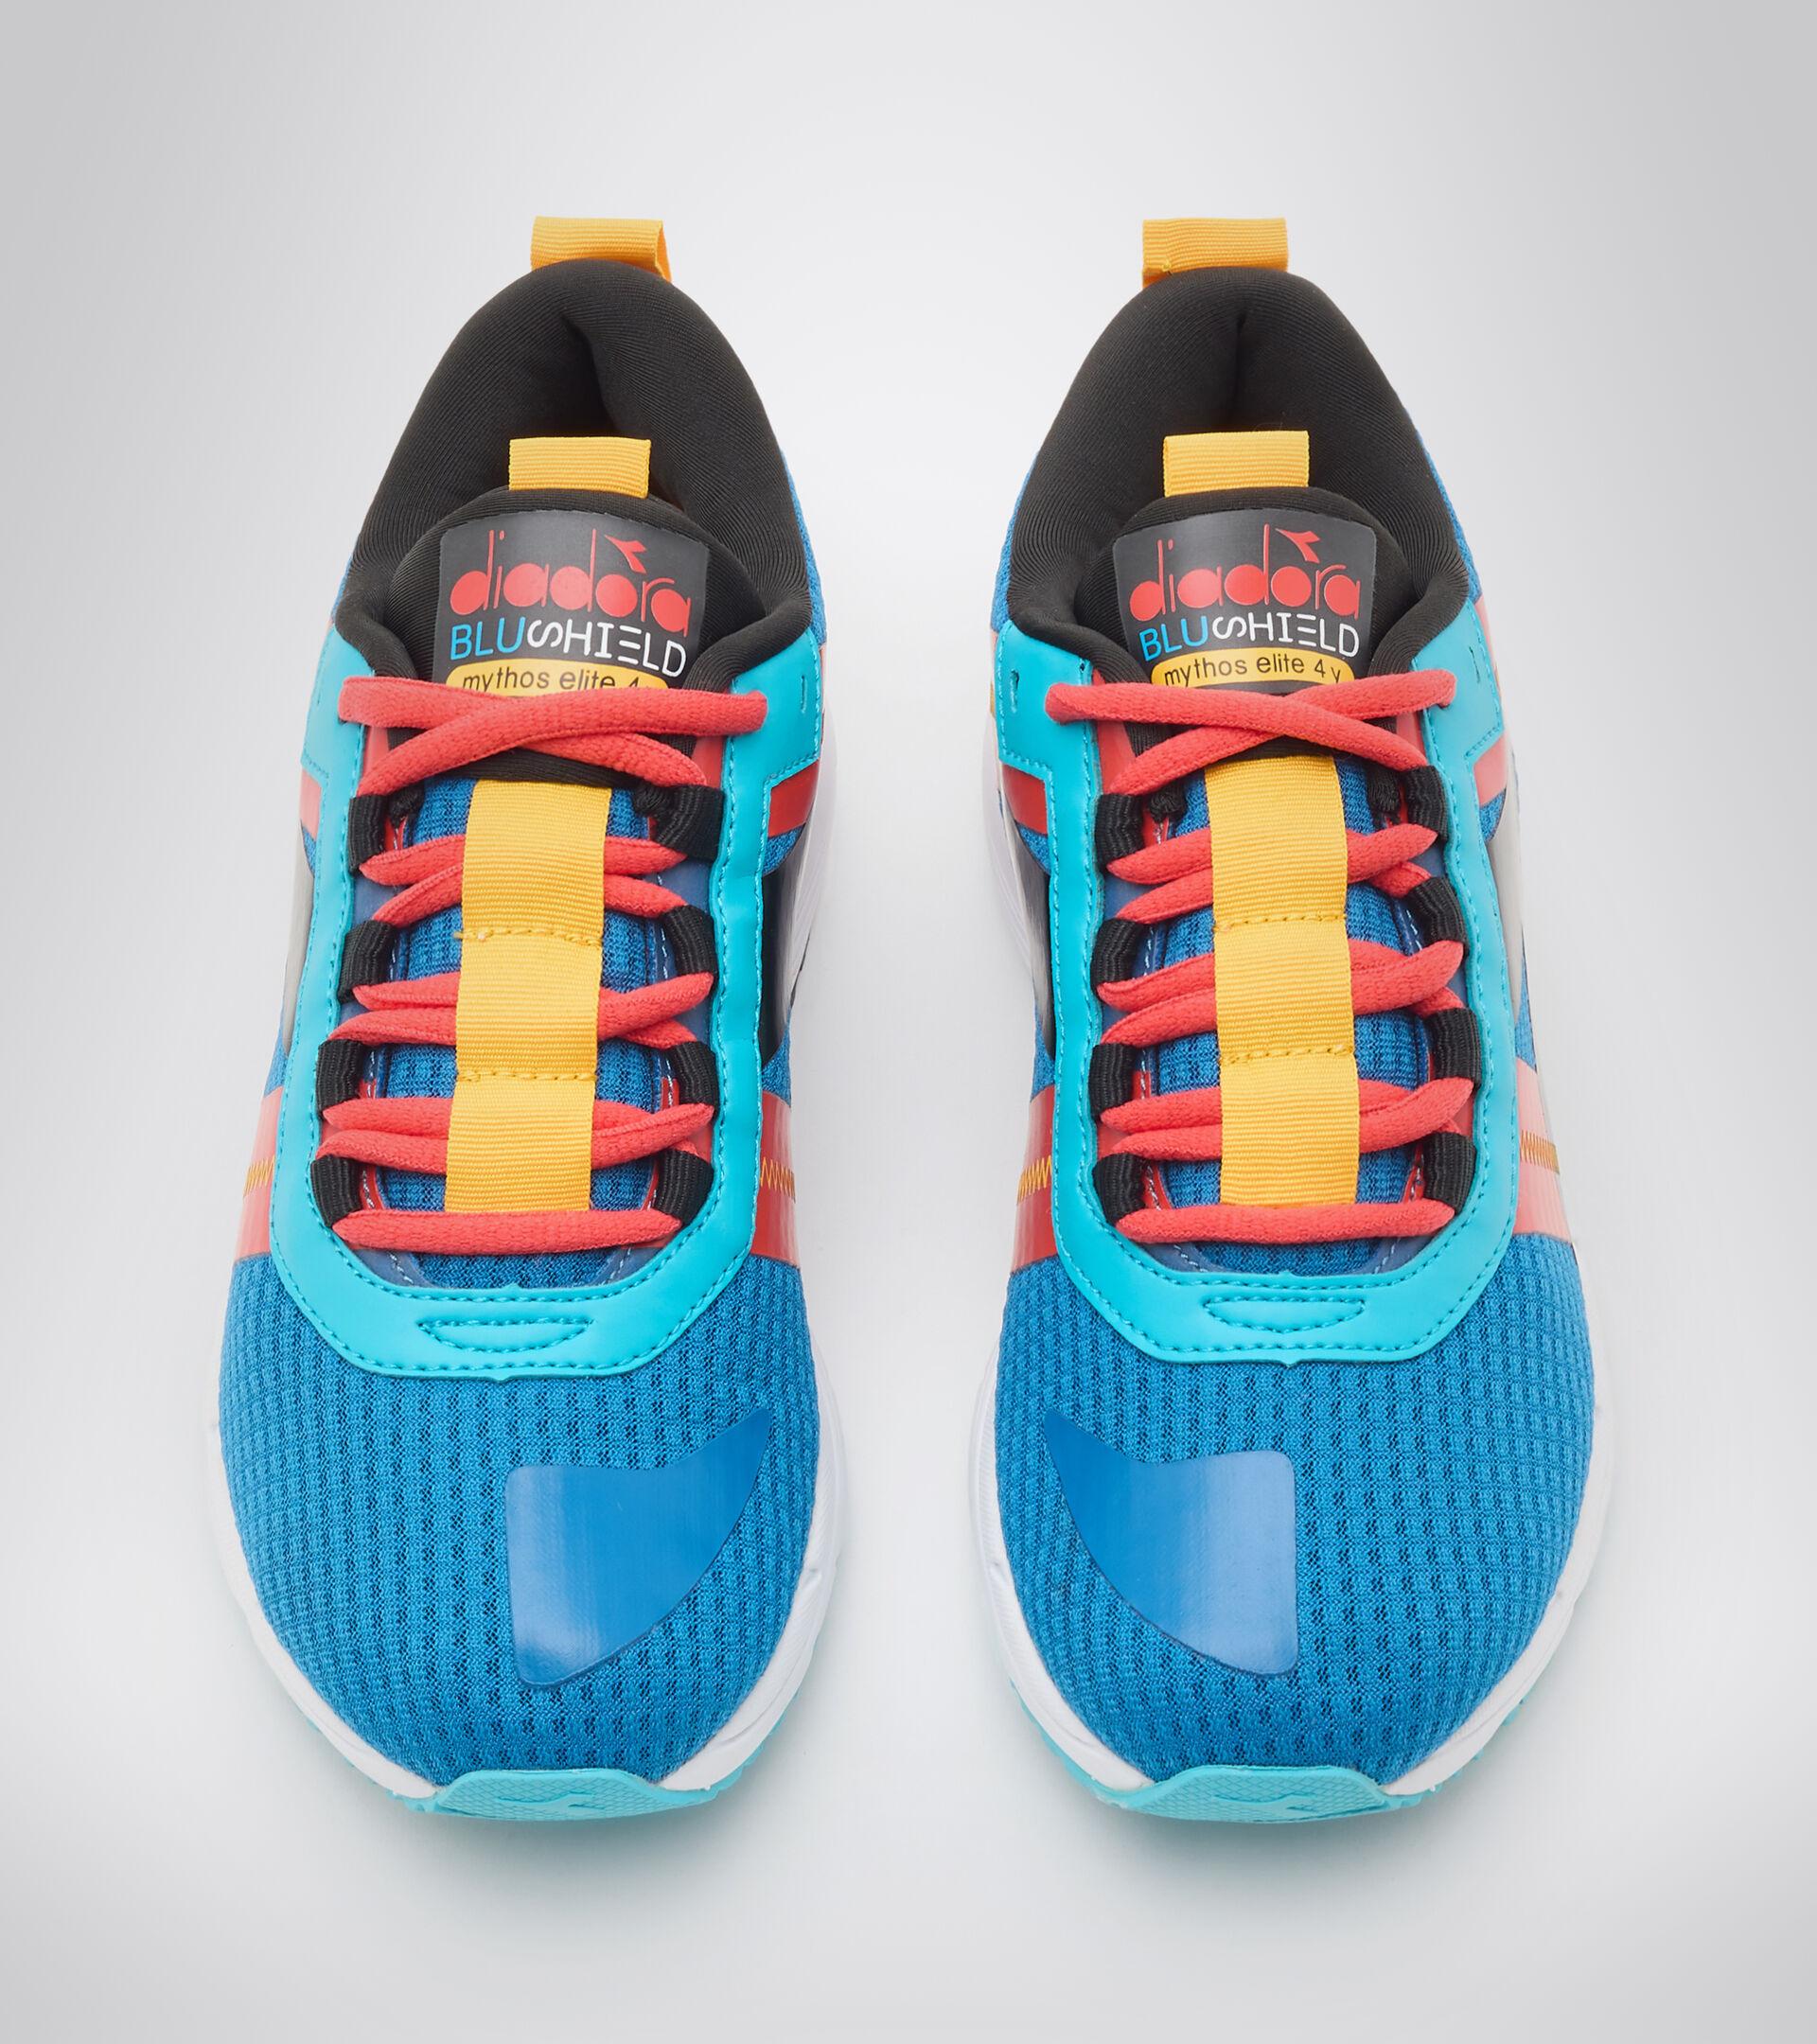 Footwear Sport BAMBINO MYTHOS BLUSHIELD ELITE 4 Y BLU MYKONOS/NERO/ROSSO FIESTA Diadora